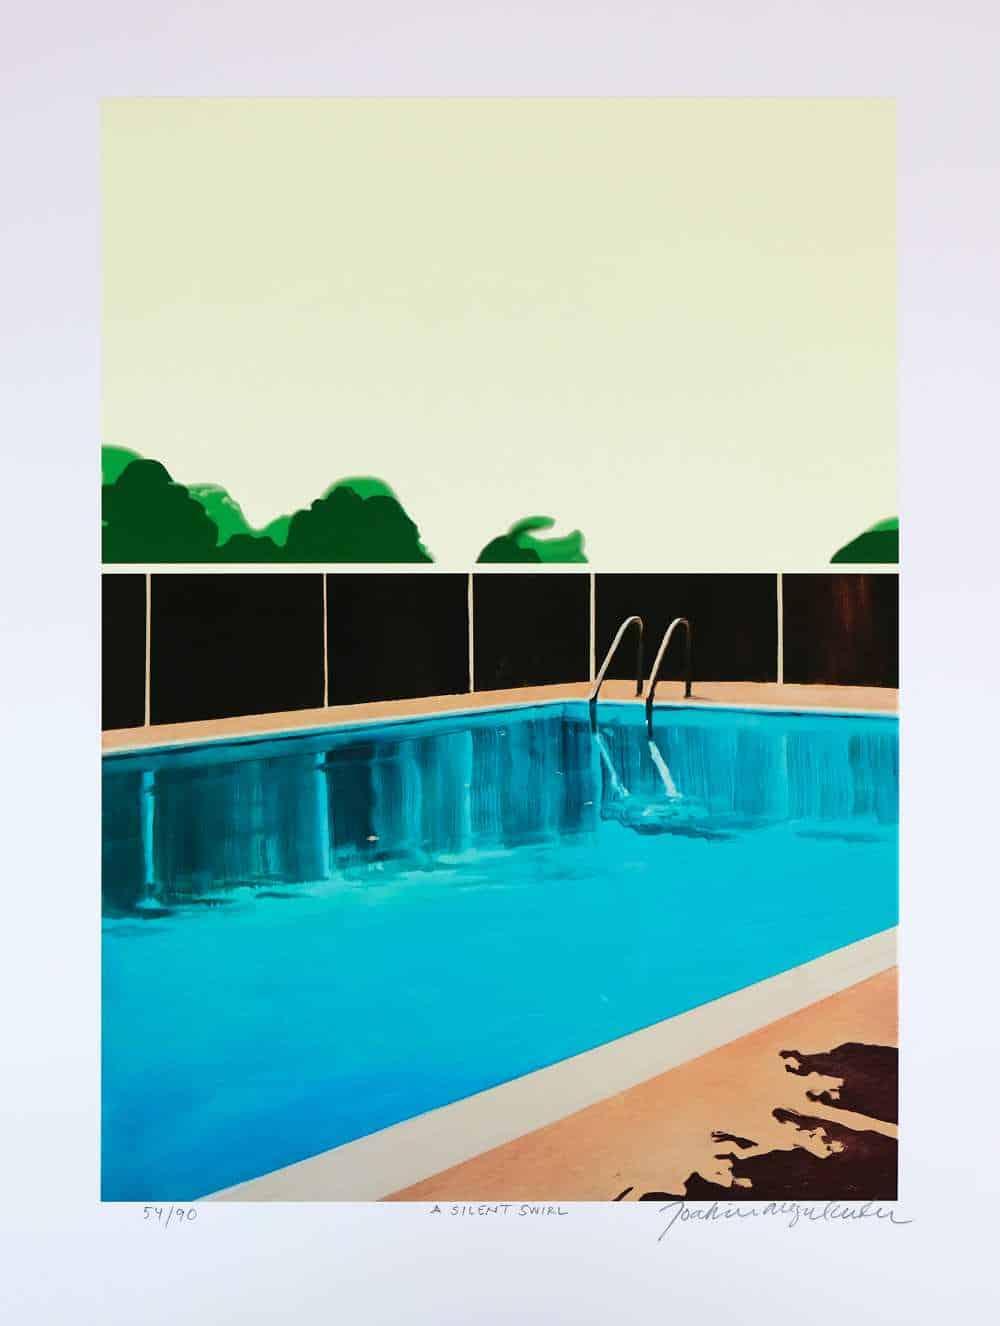 Joakim Allgulander - A Silent Swirl